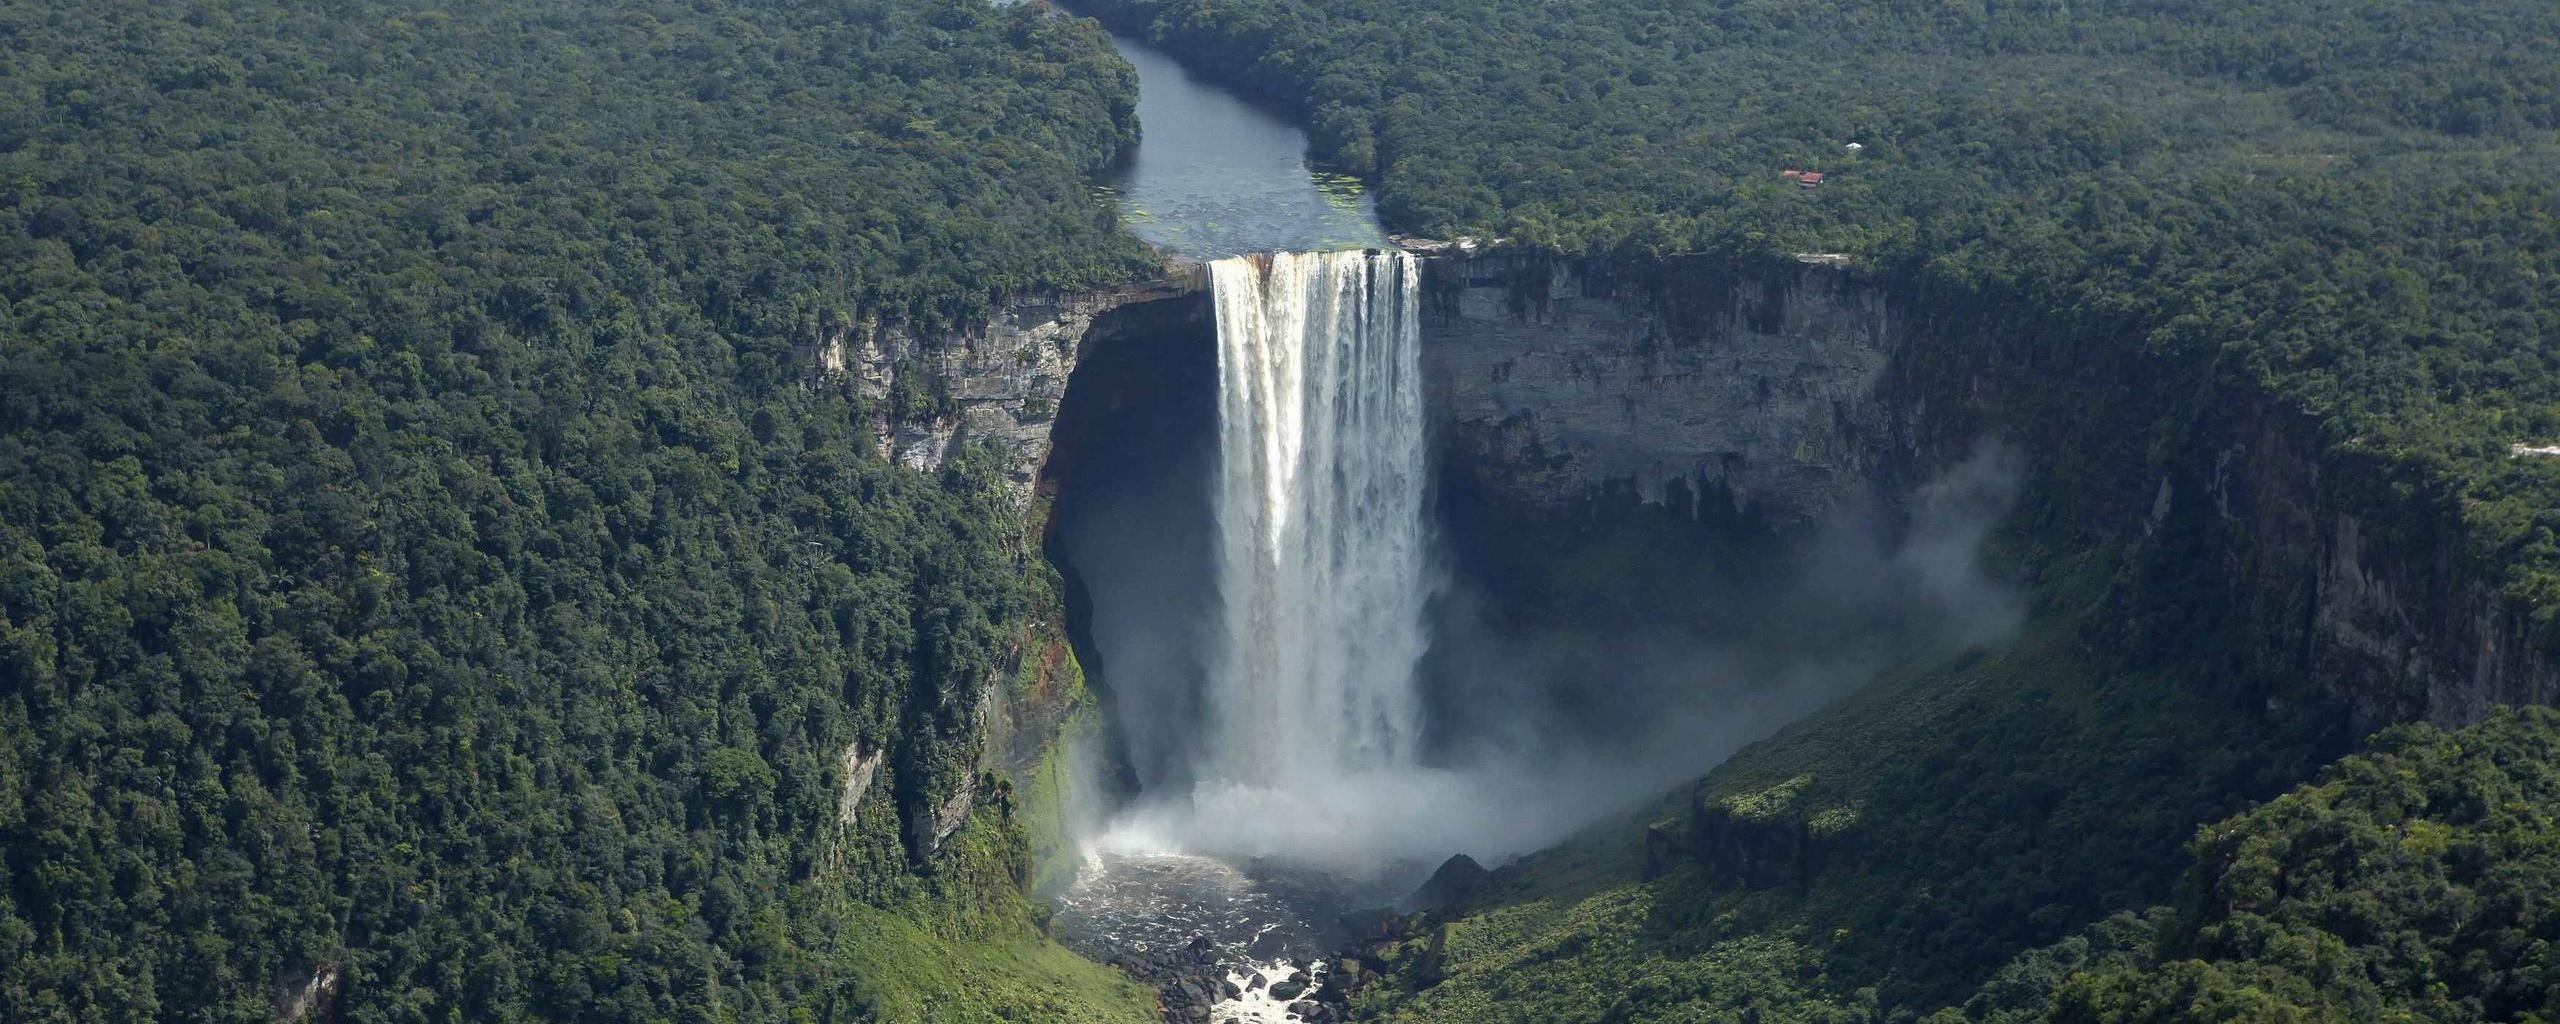 kaieteur_falls_in_southern_guyana